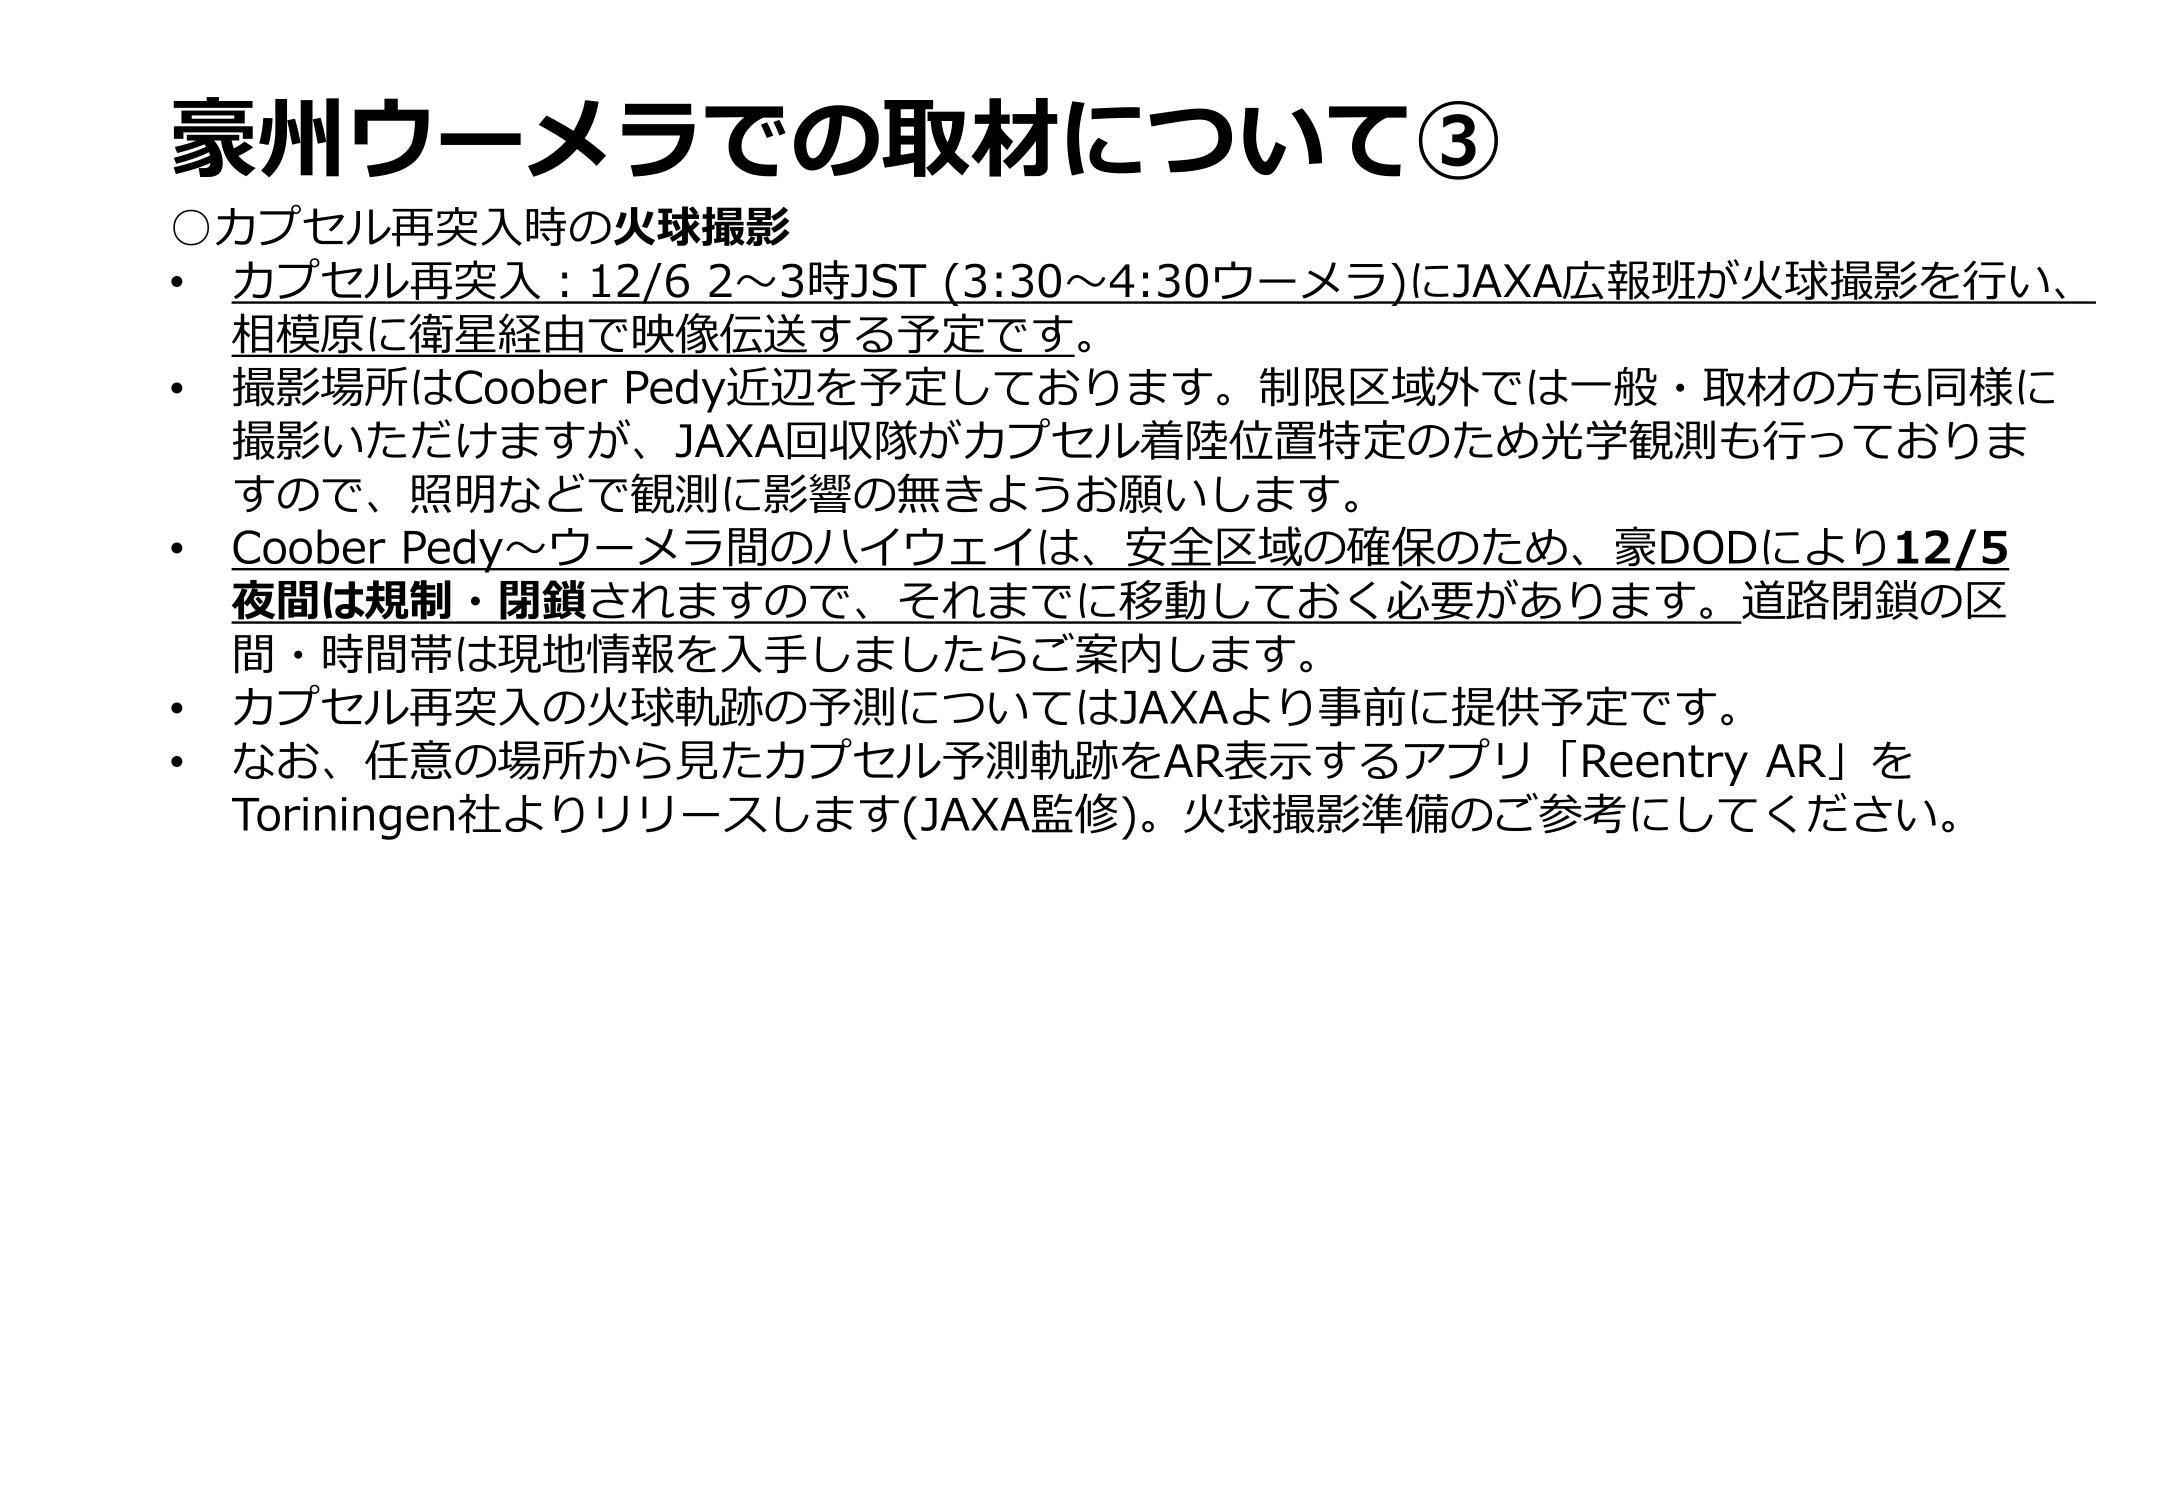 f:id:Imamura:20201117222314p:plain